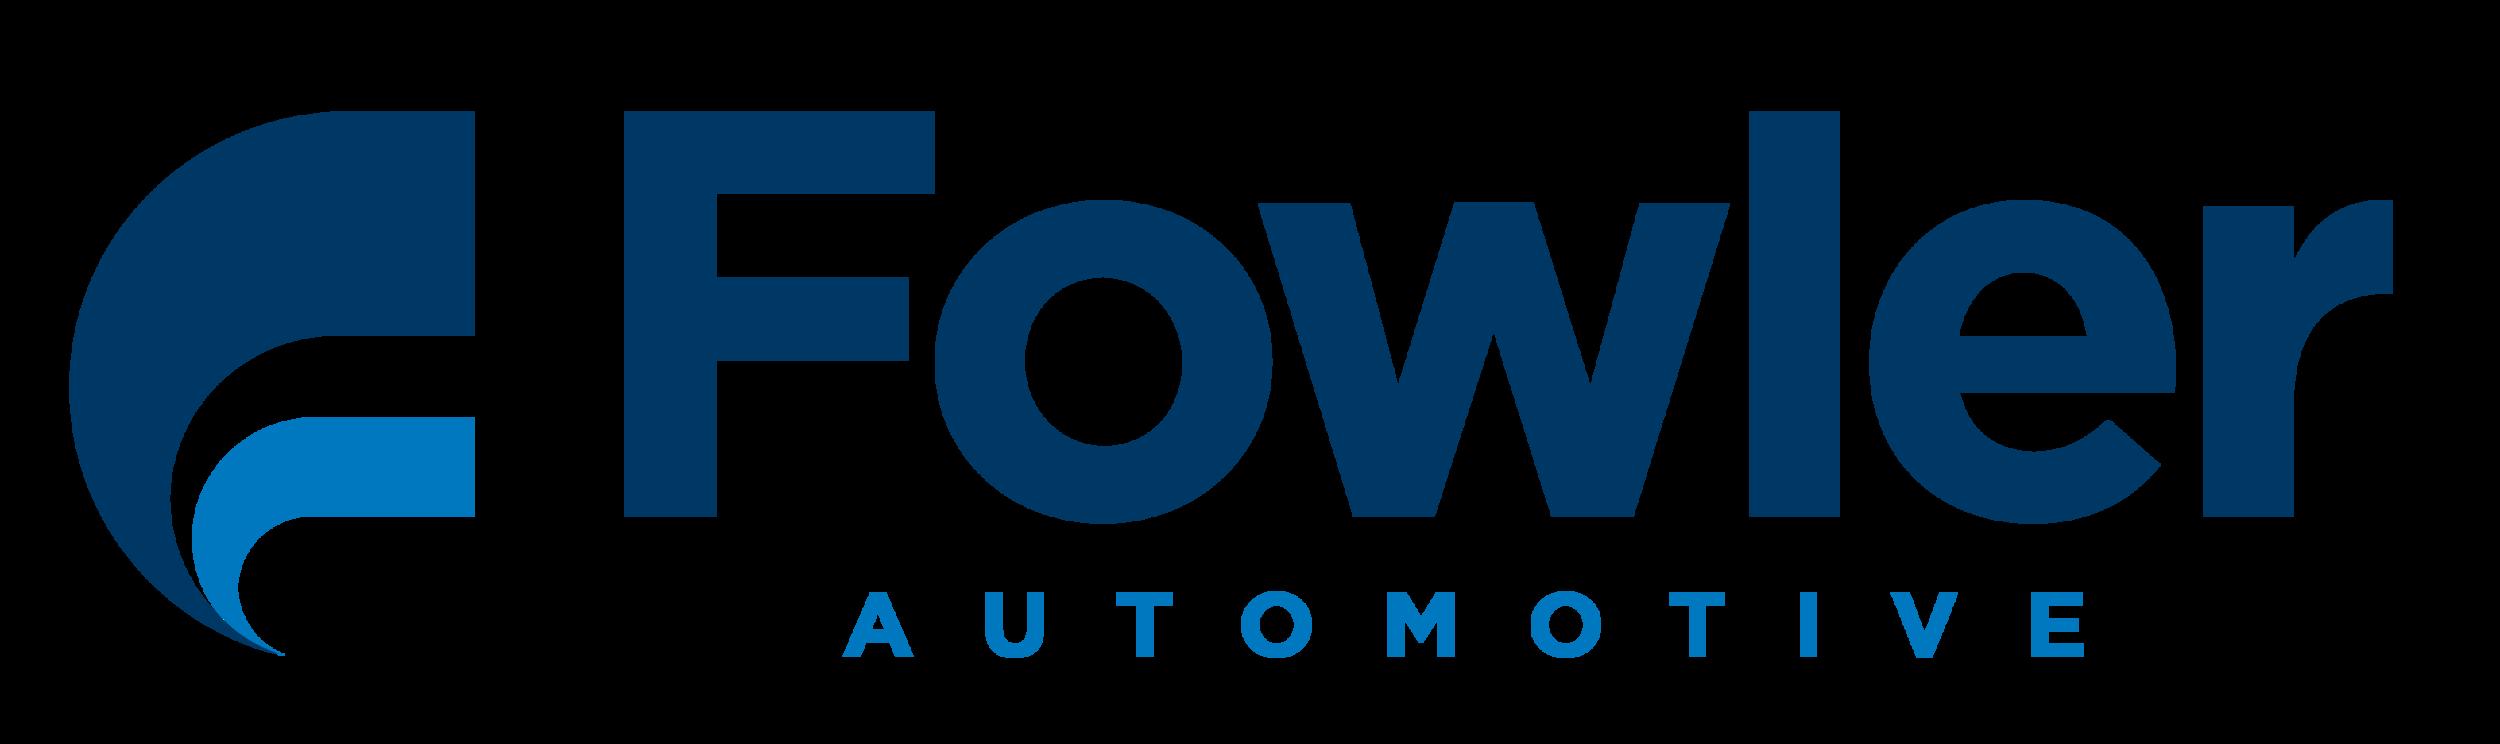 Fowler_Logo.png